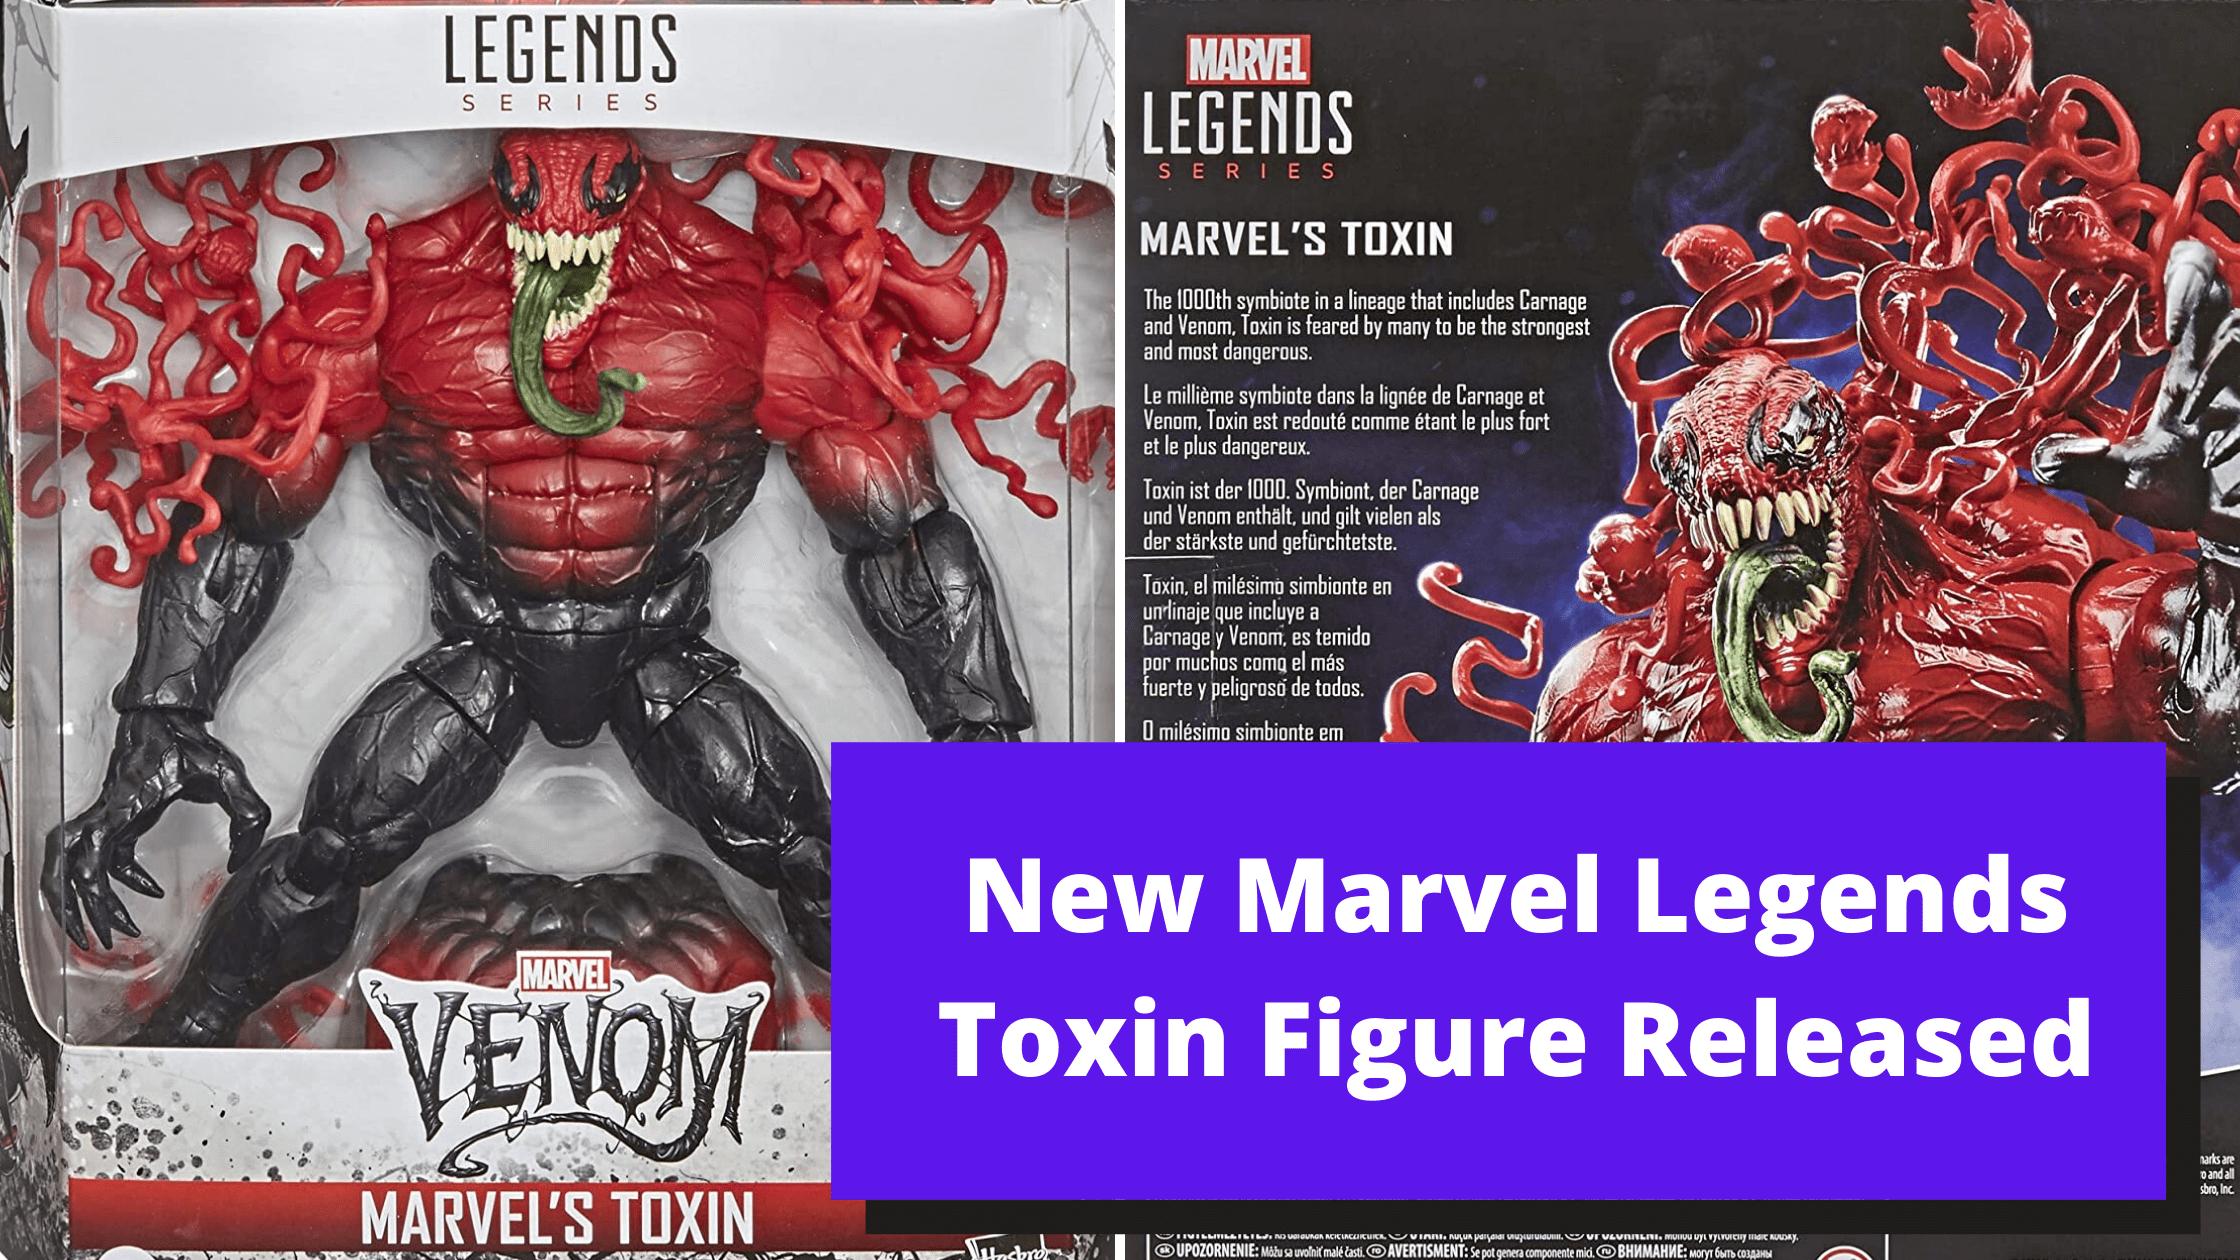 New Marvel Legends Toxin Figure Released